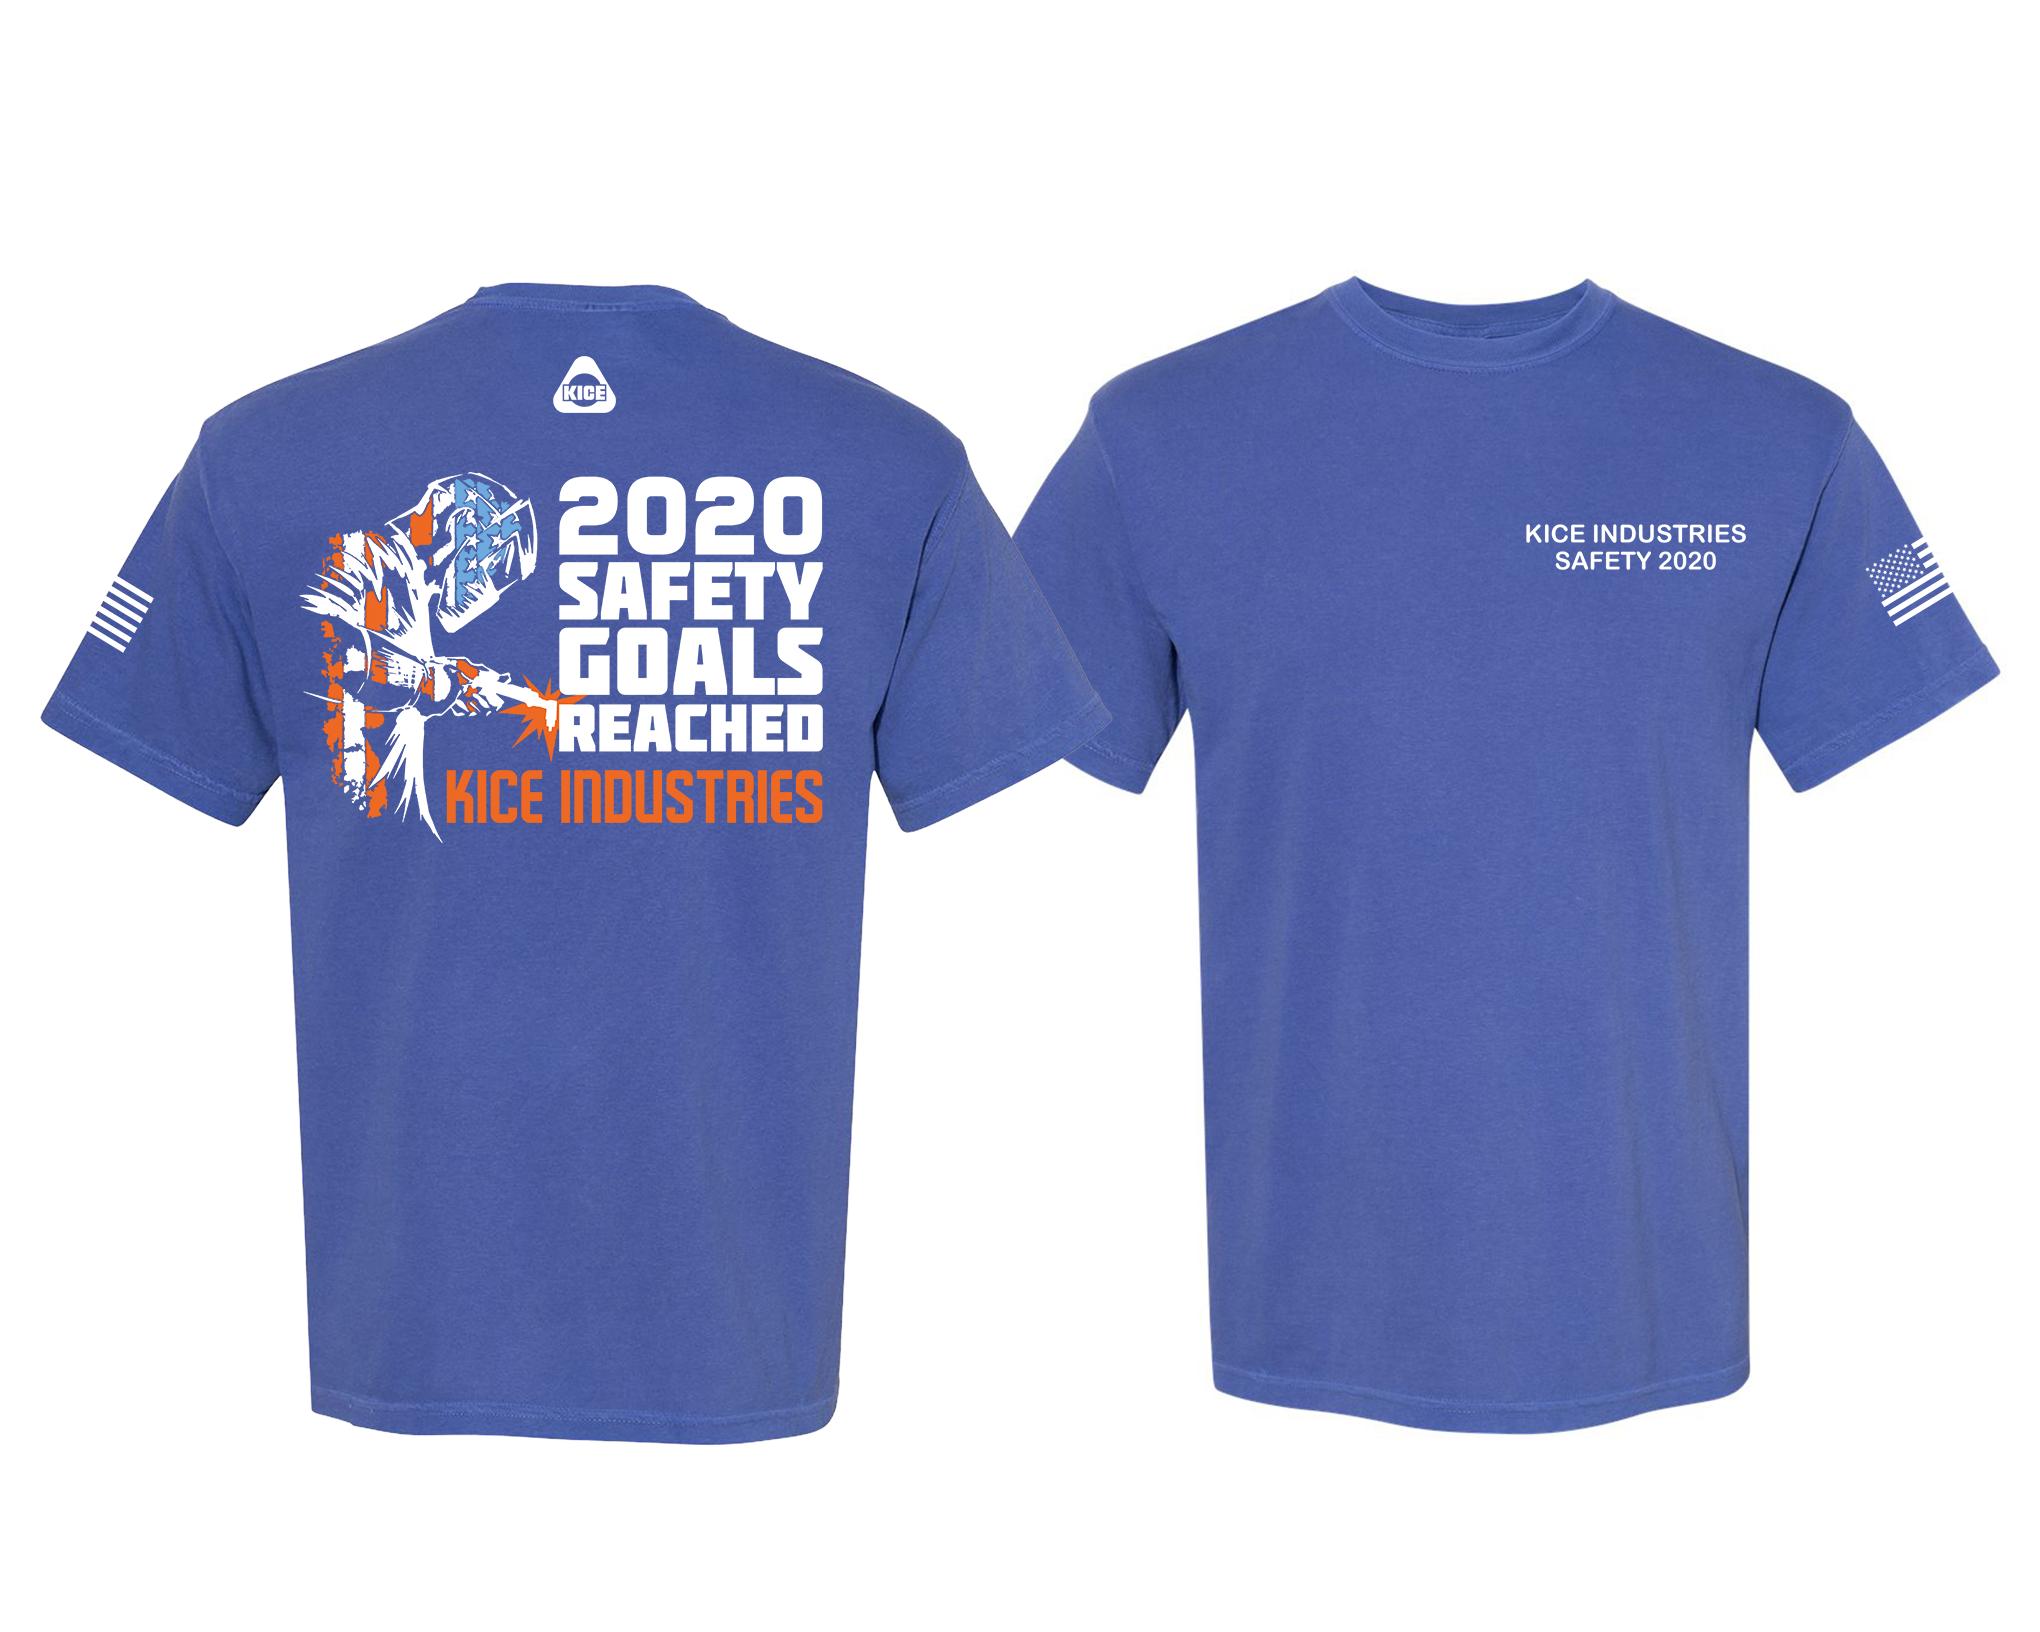 Safety T-Shirt Design